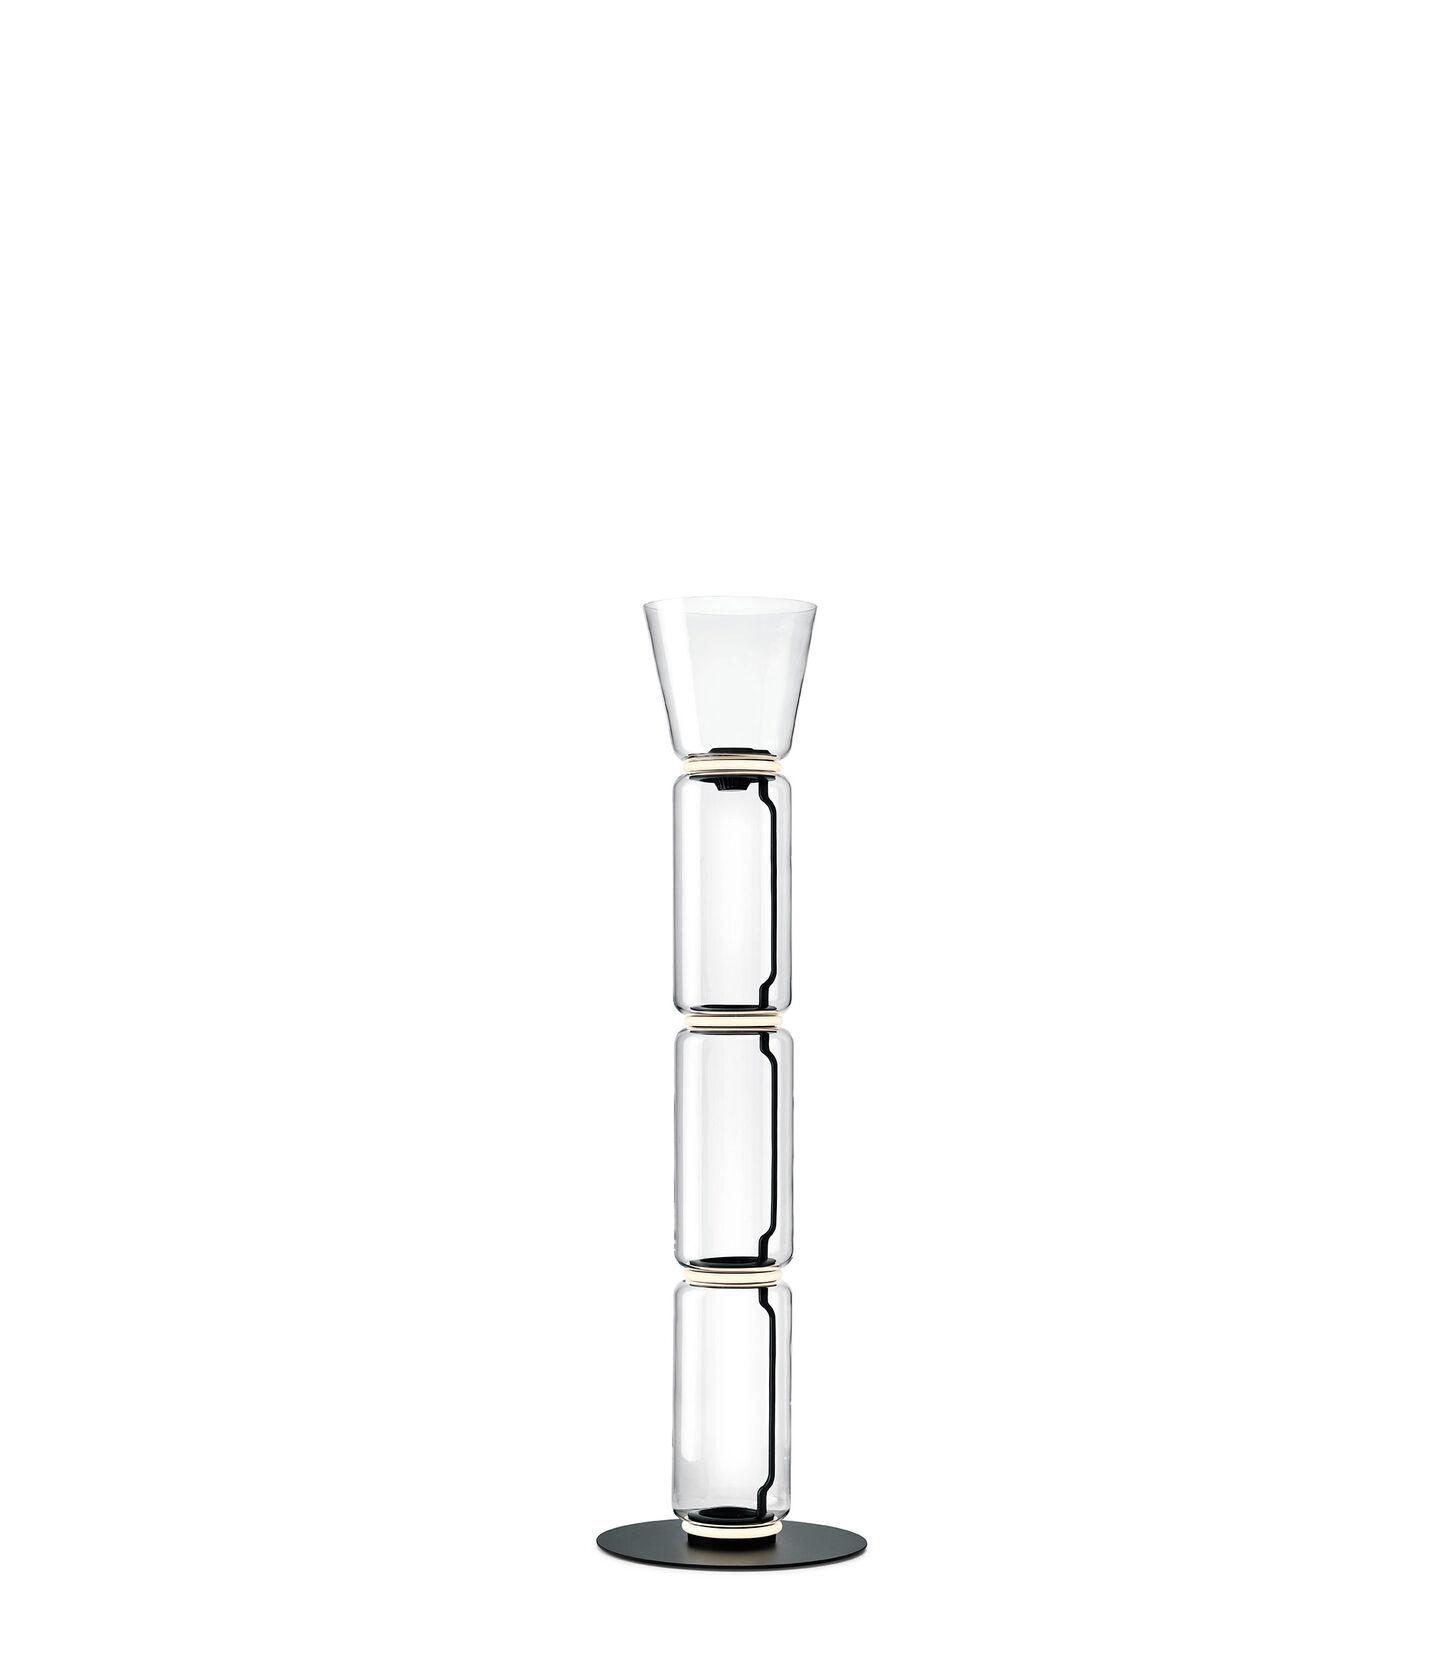 noctambule-floor-3-high-cylinders-and-cone-big-base-grcic-flos-F0267000-product-still-life-big